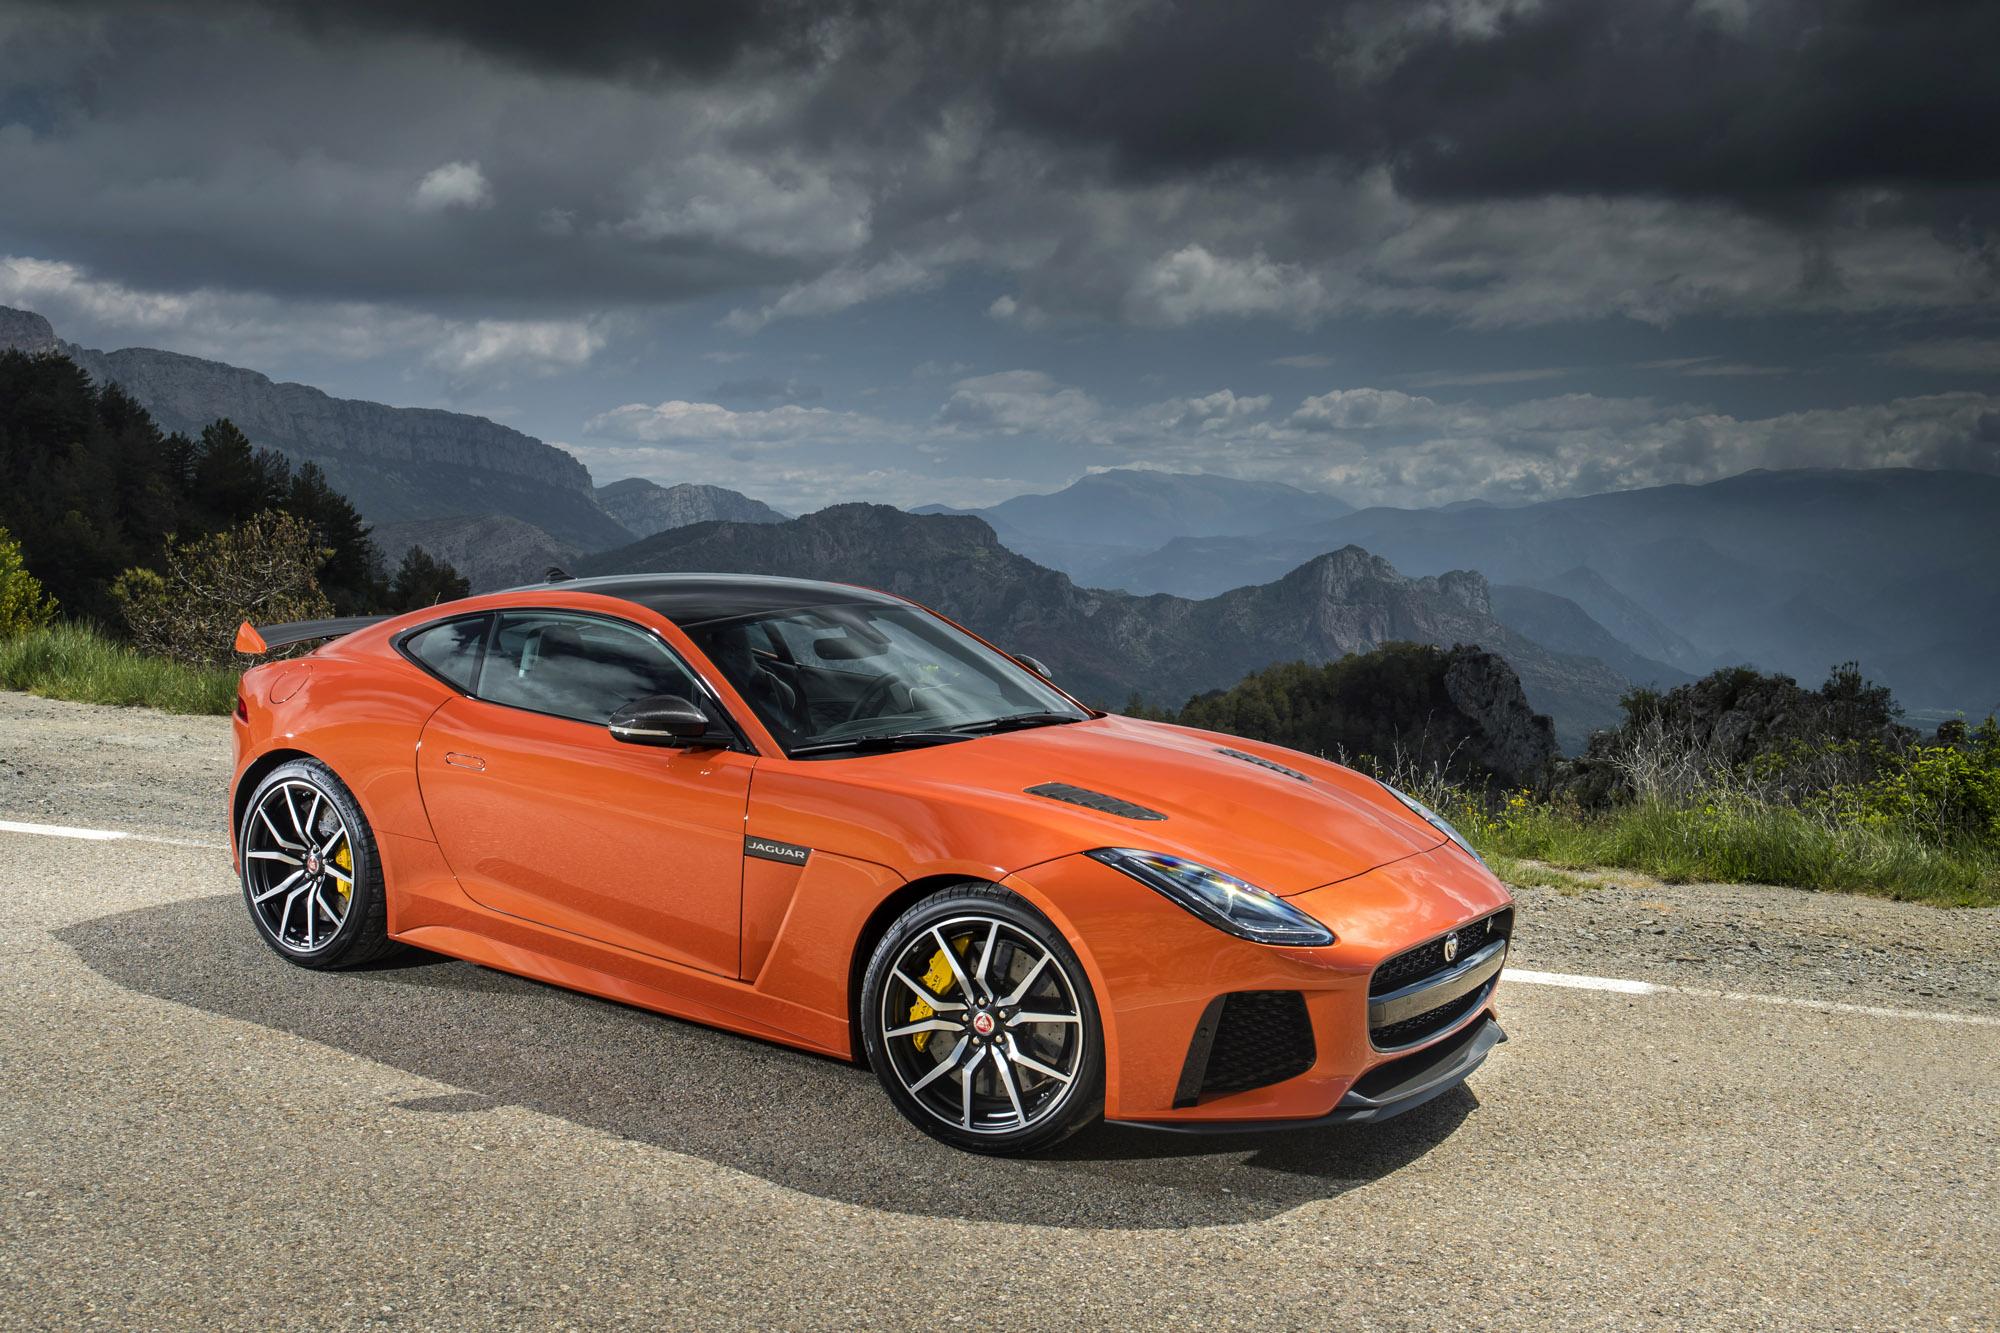 Jaguar Cars F Type Prices